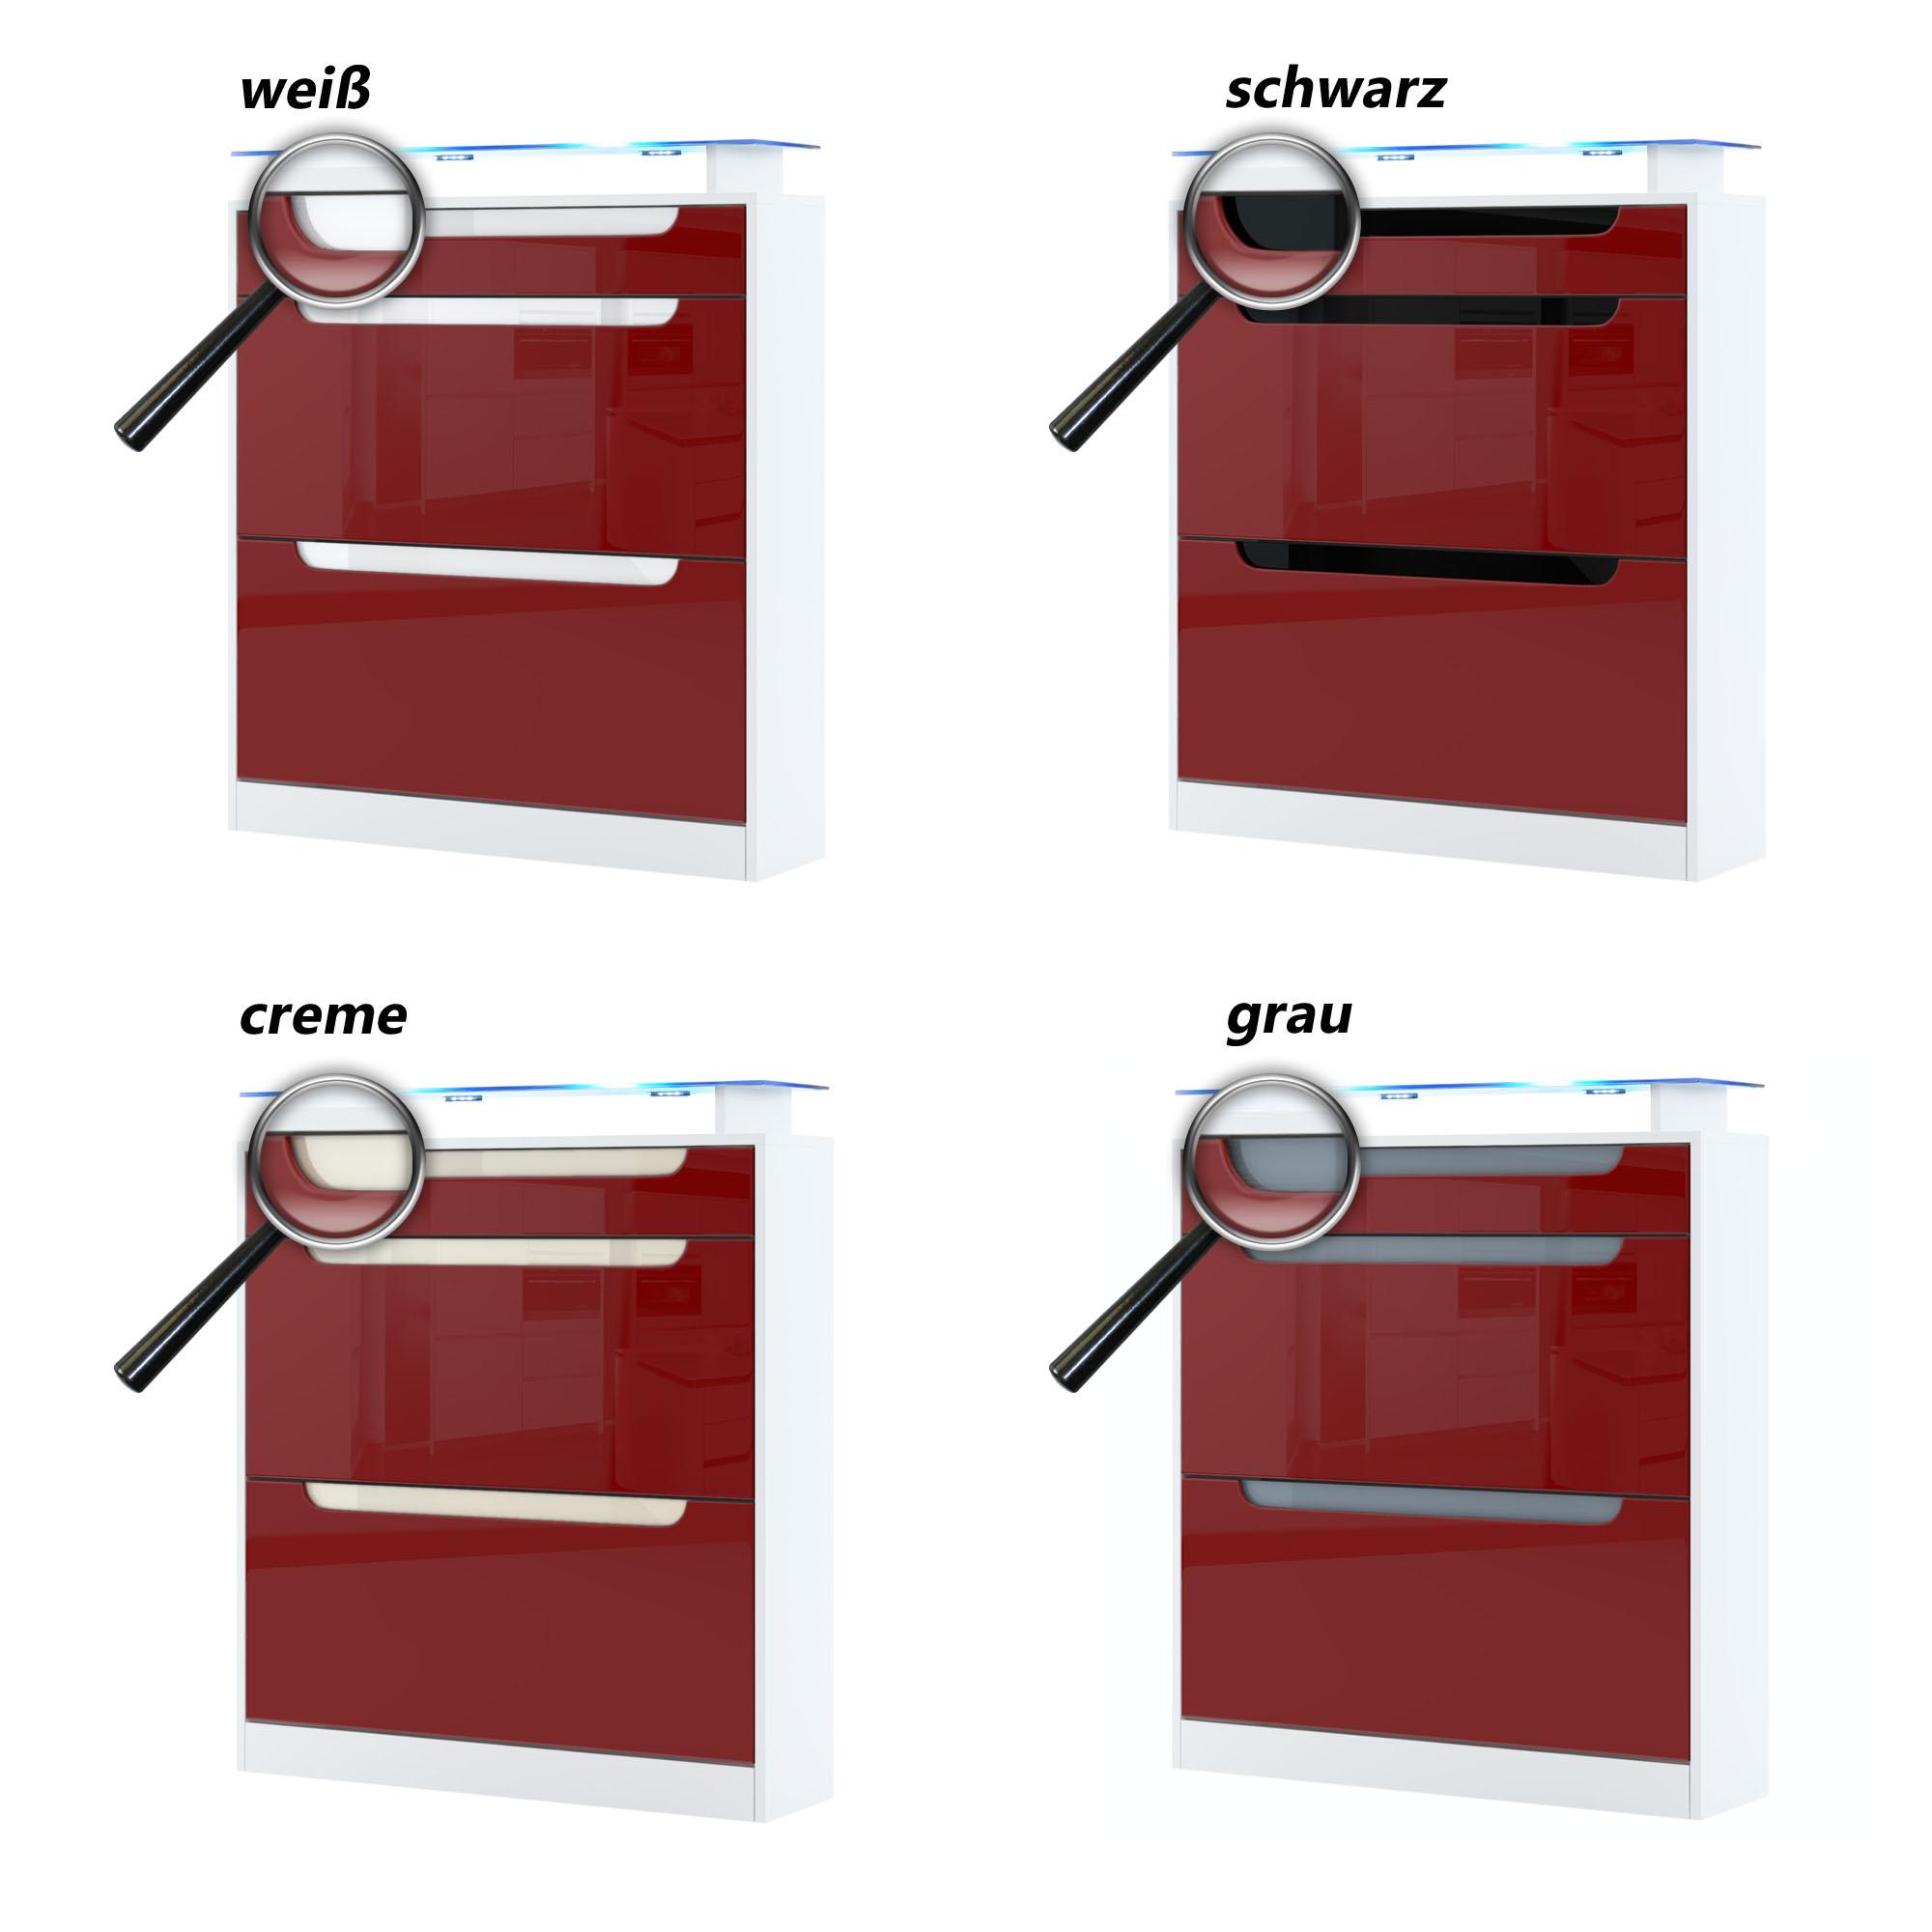 schuhschrank schuhkipper schuhregal flur regal schrank. Black Bedroom Furniture Sets. Home Design Ideas